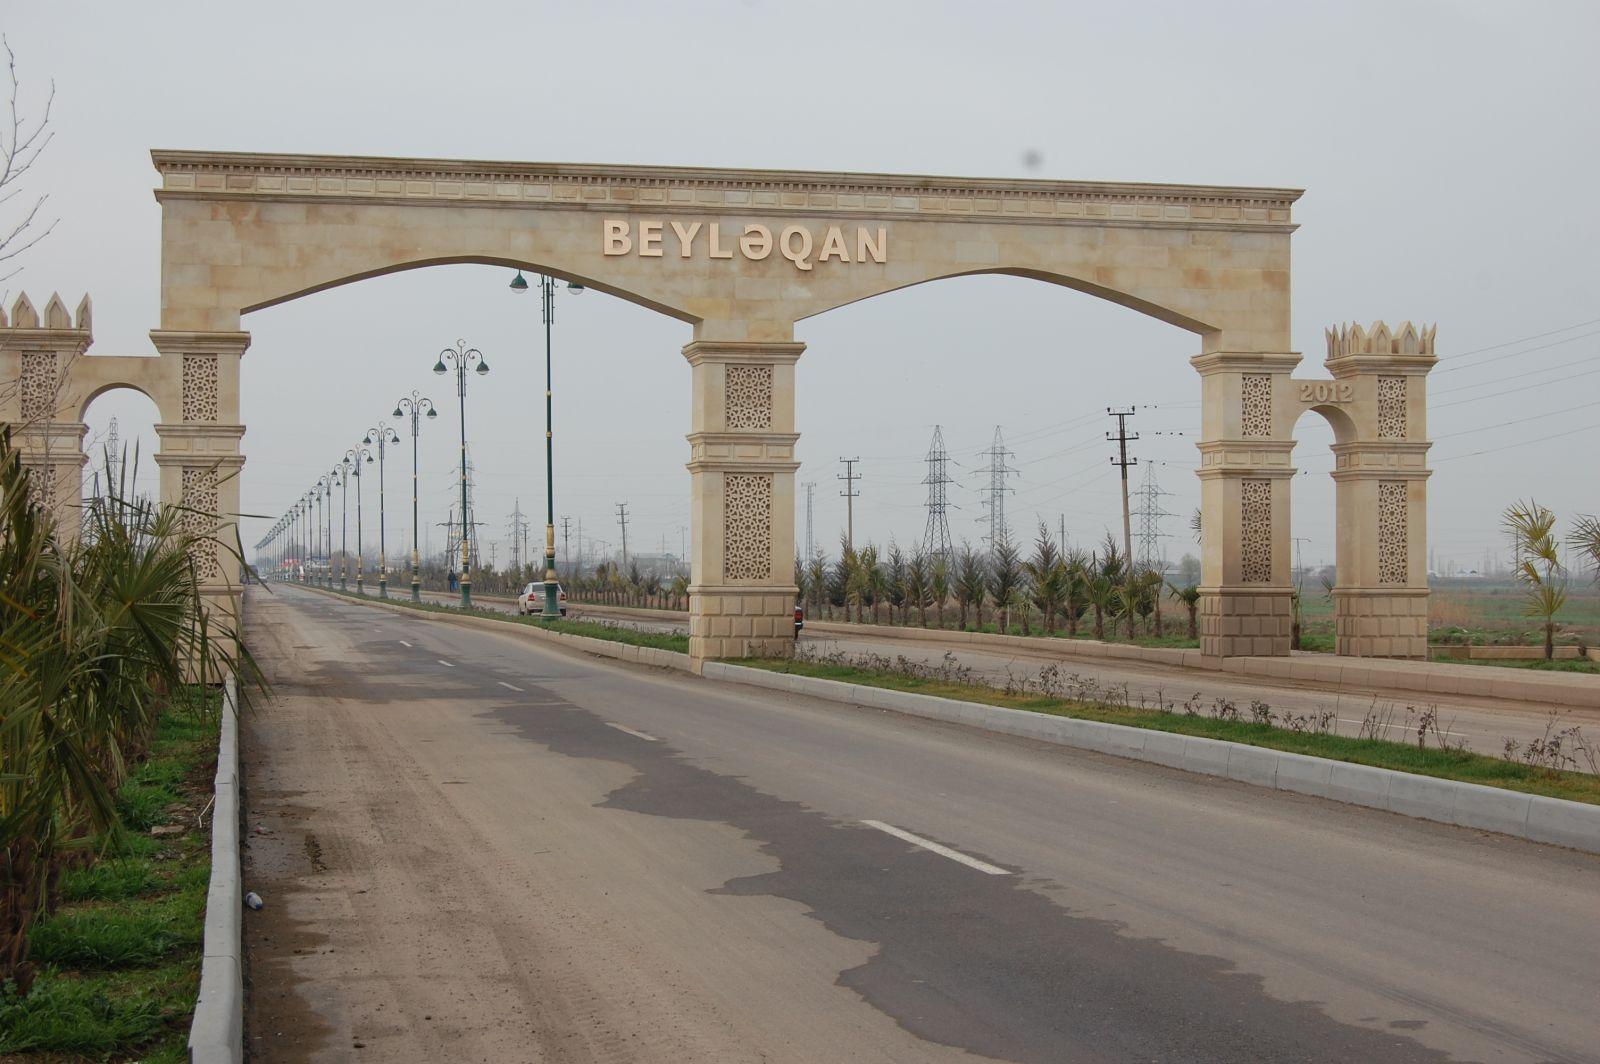 Beylagan district